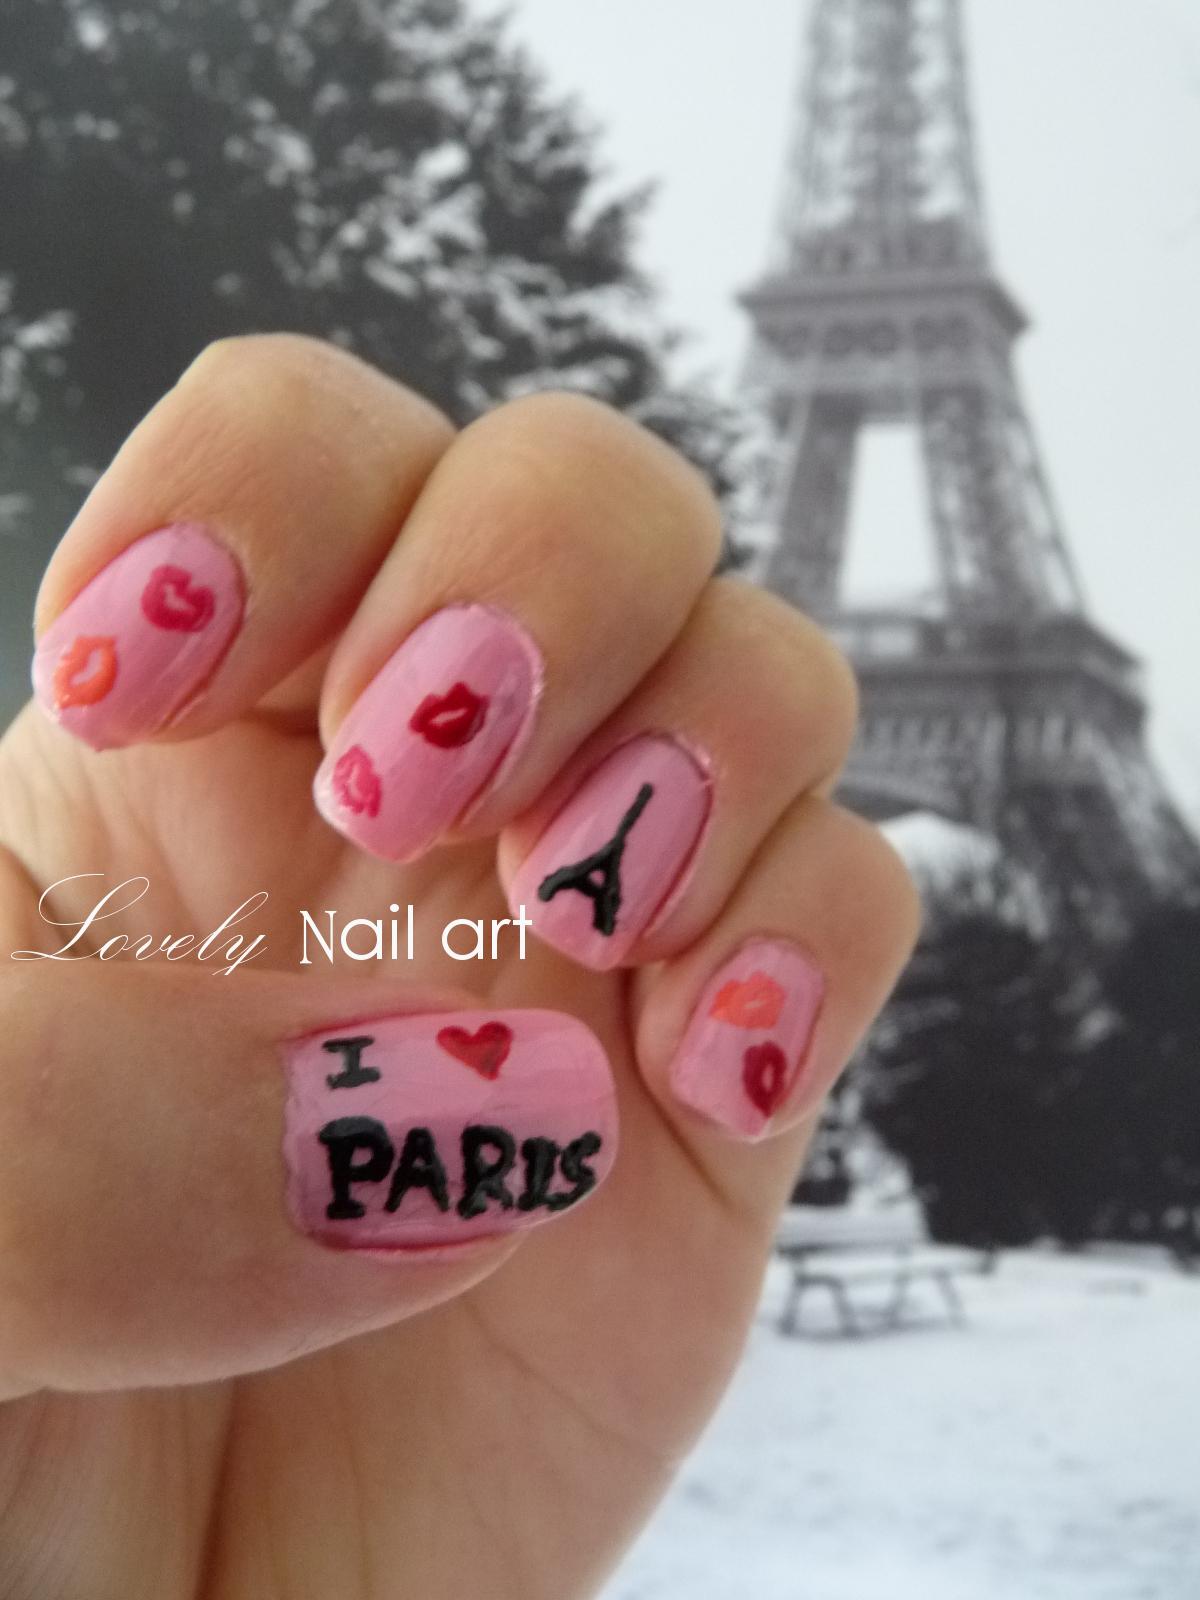 Lovely Nail Art: I love Paris!